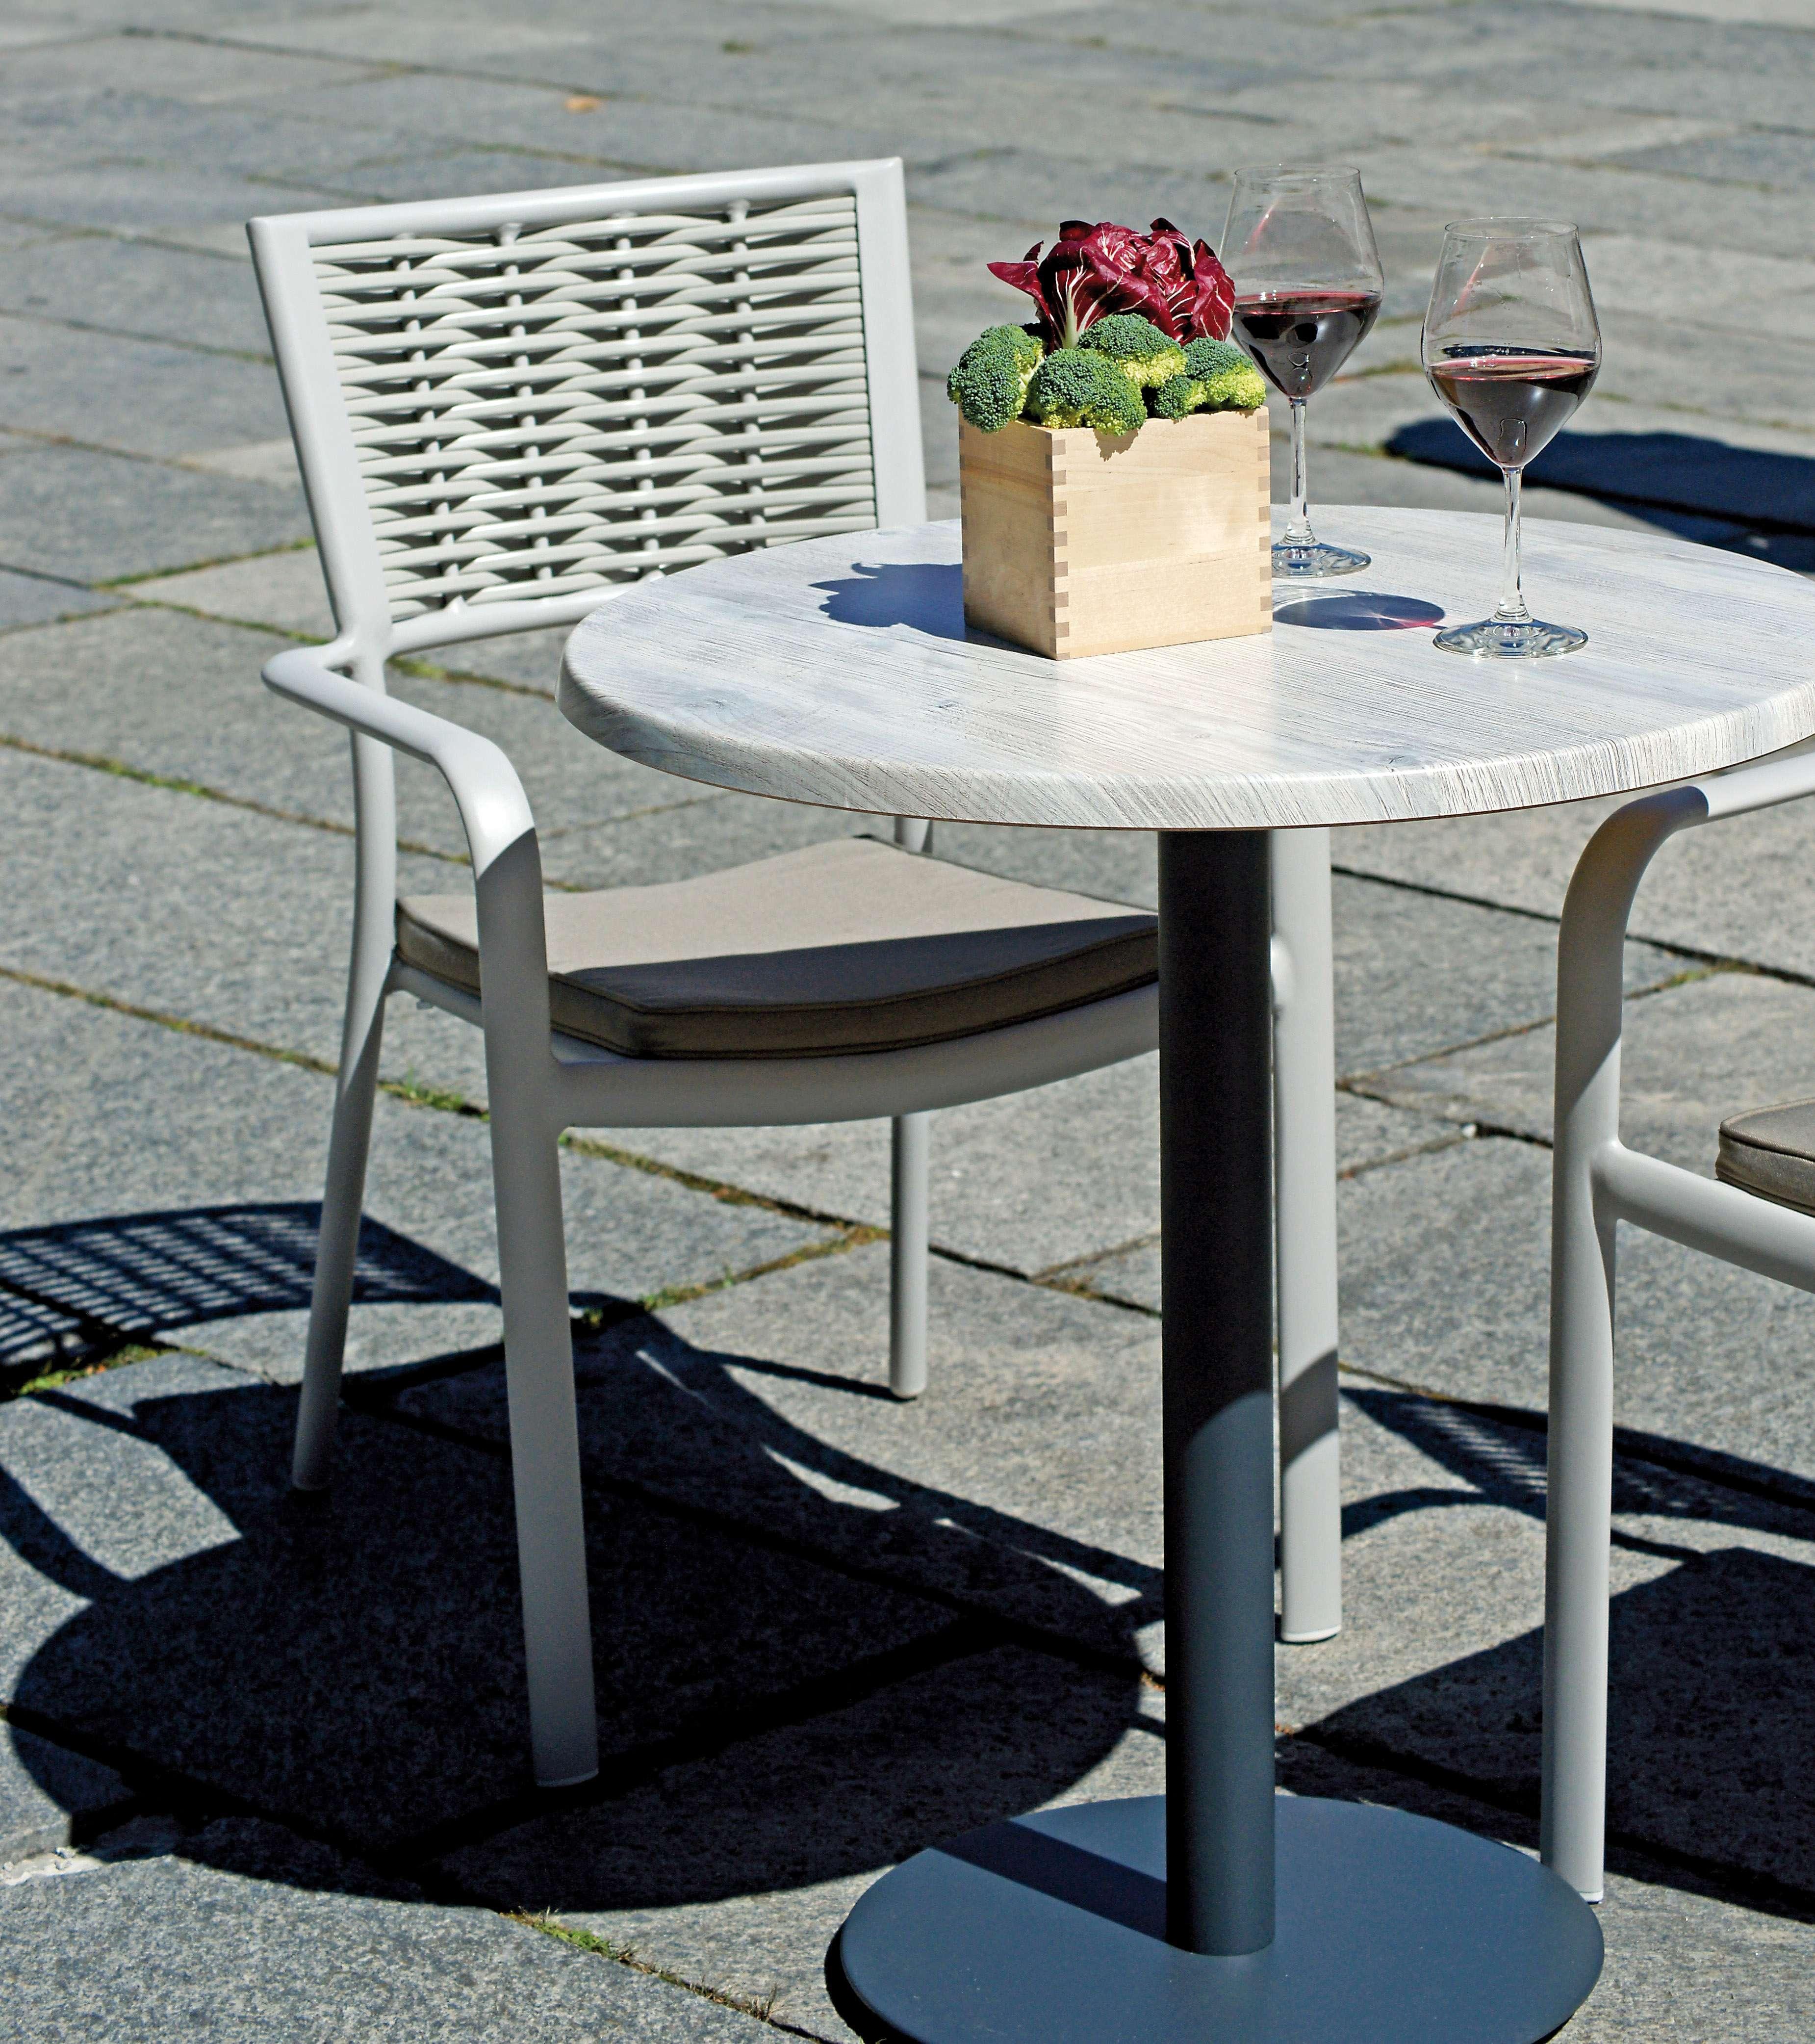 Ambientazione cc61 greenwood mobili da giardino - Mobili da giardino in teak ...